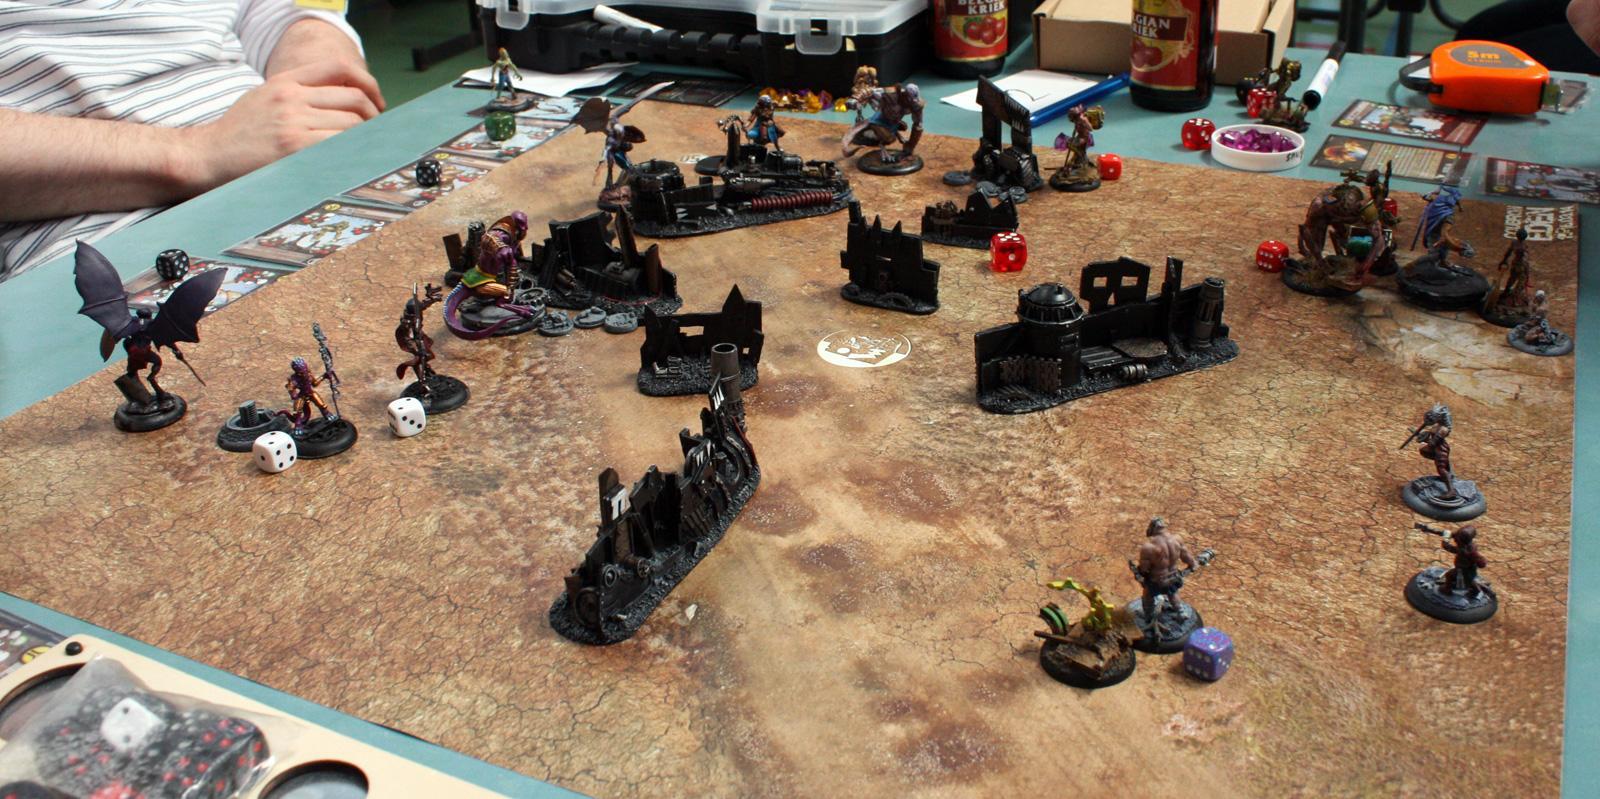 Angel, Askari, Dante, Eden, Isc, Joker, Nephilim, Post-apocalyptic, Resistance, Ruin, Skirmish, Tournament, Wreck